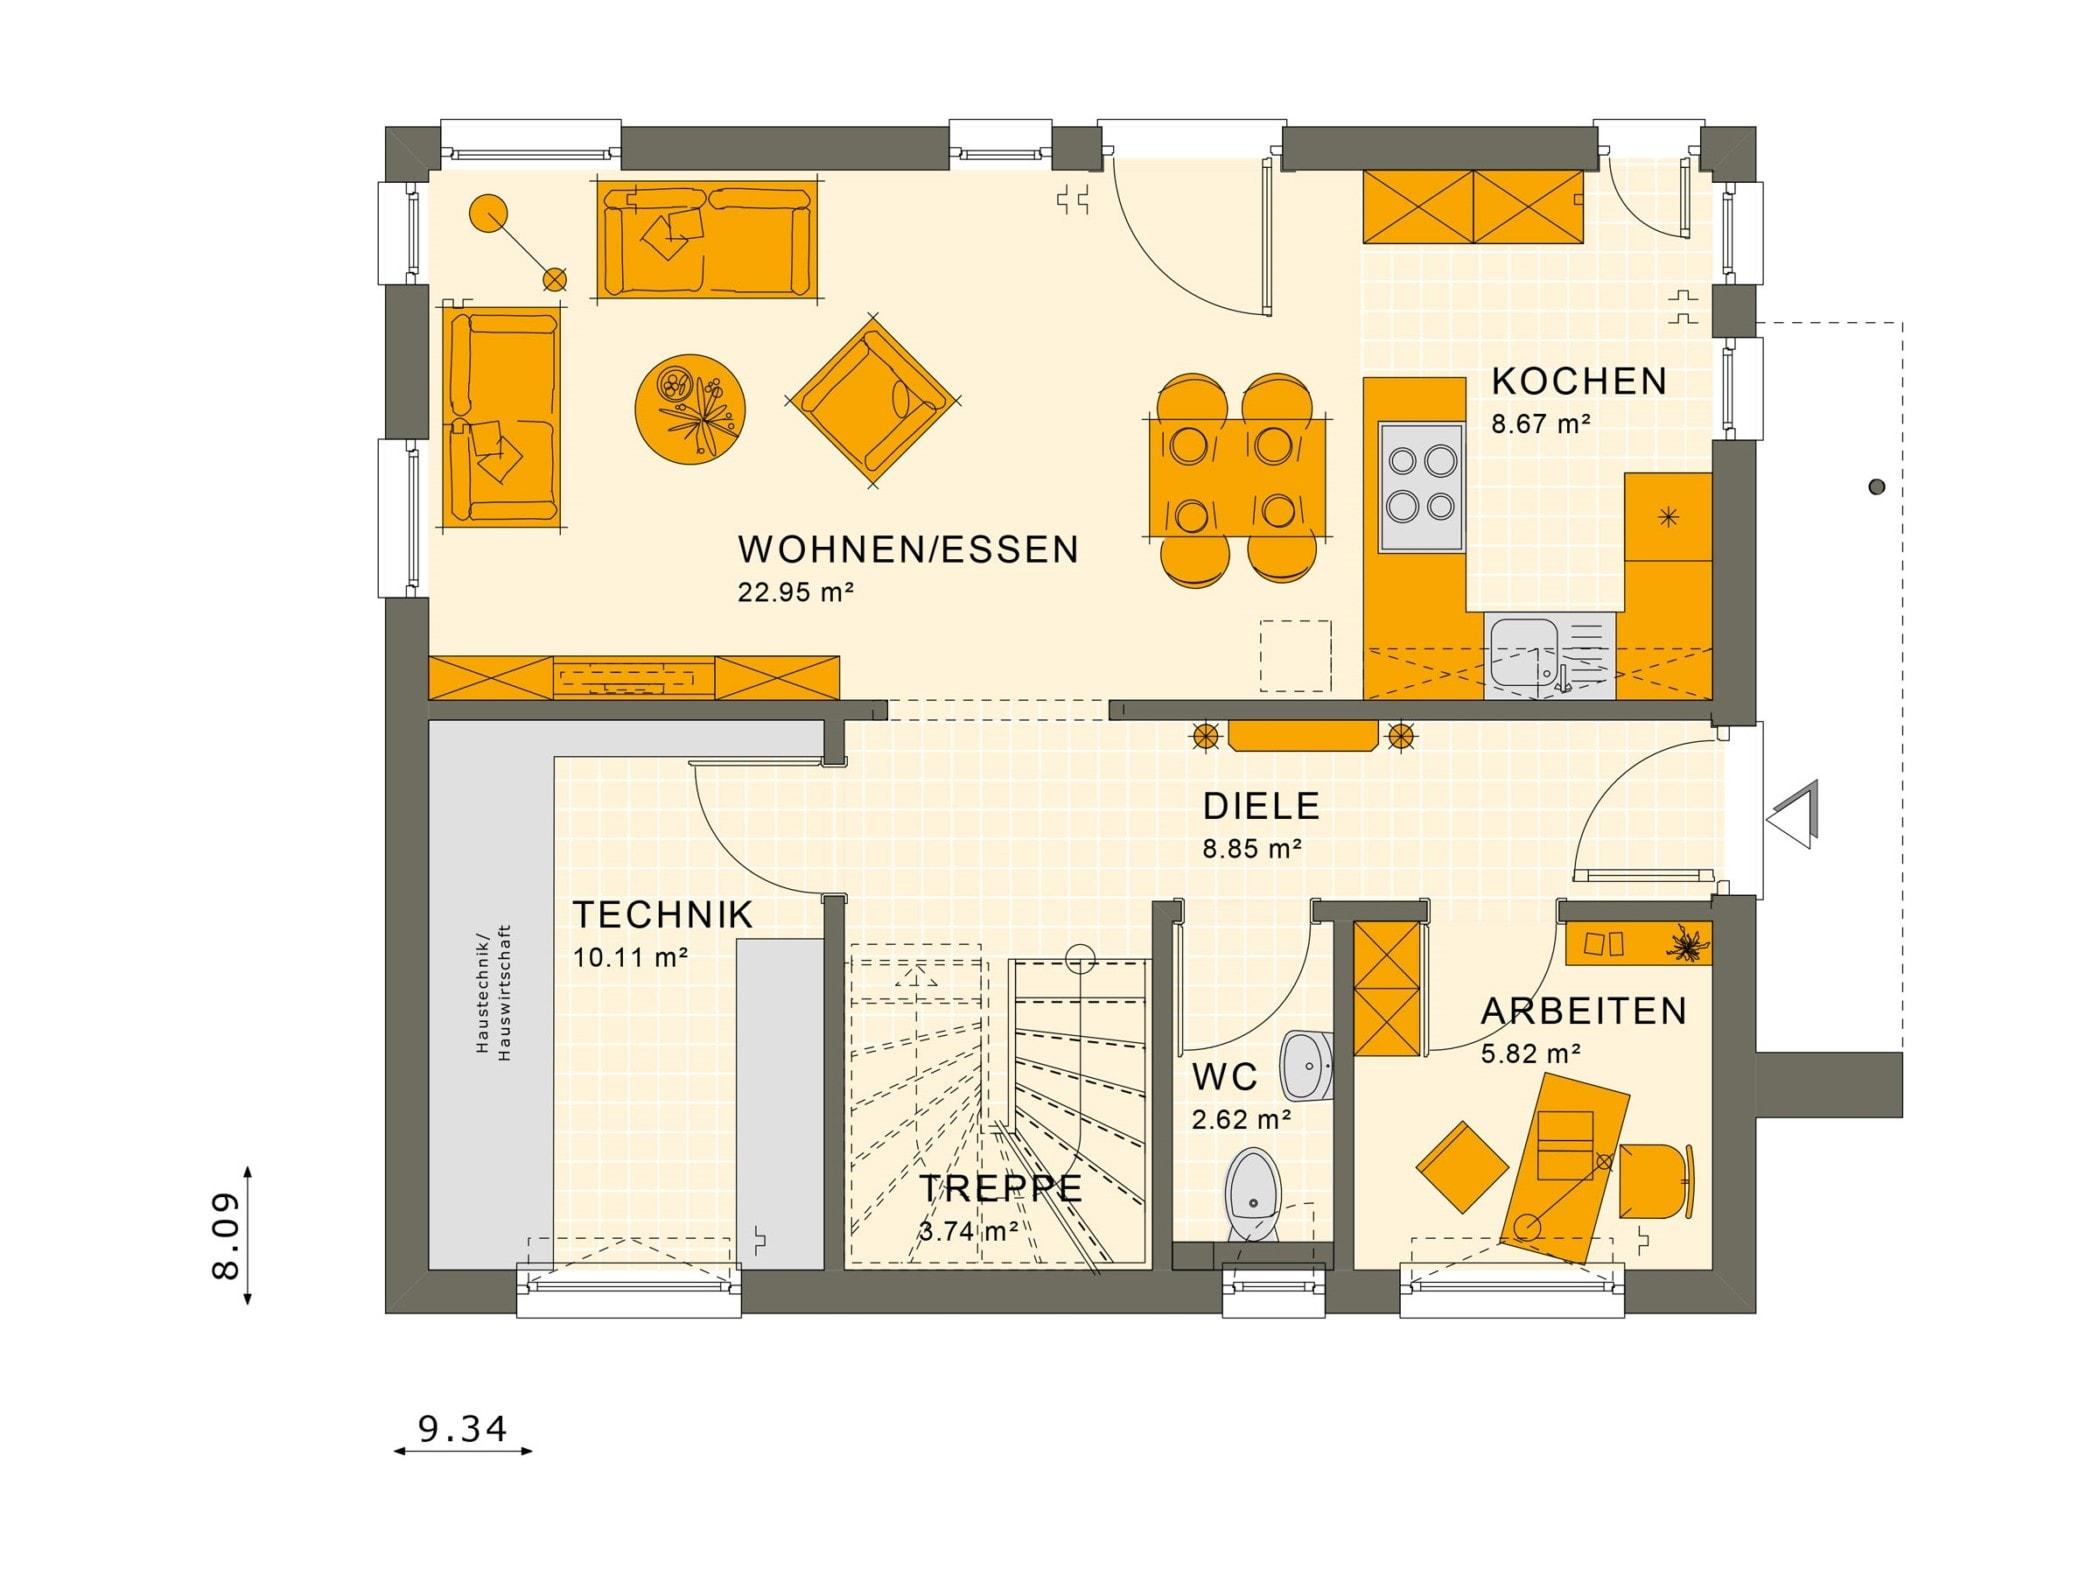 Fertighaus Grundriss Erdgeschoss offen mit Büro - Haus bauen Ideen Einfamilienhaus SUNSHINE 125 V3 von Living Haus - HausbauDirekt.de